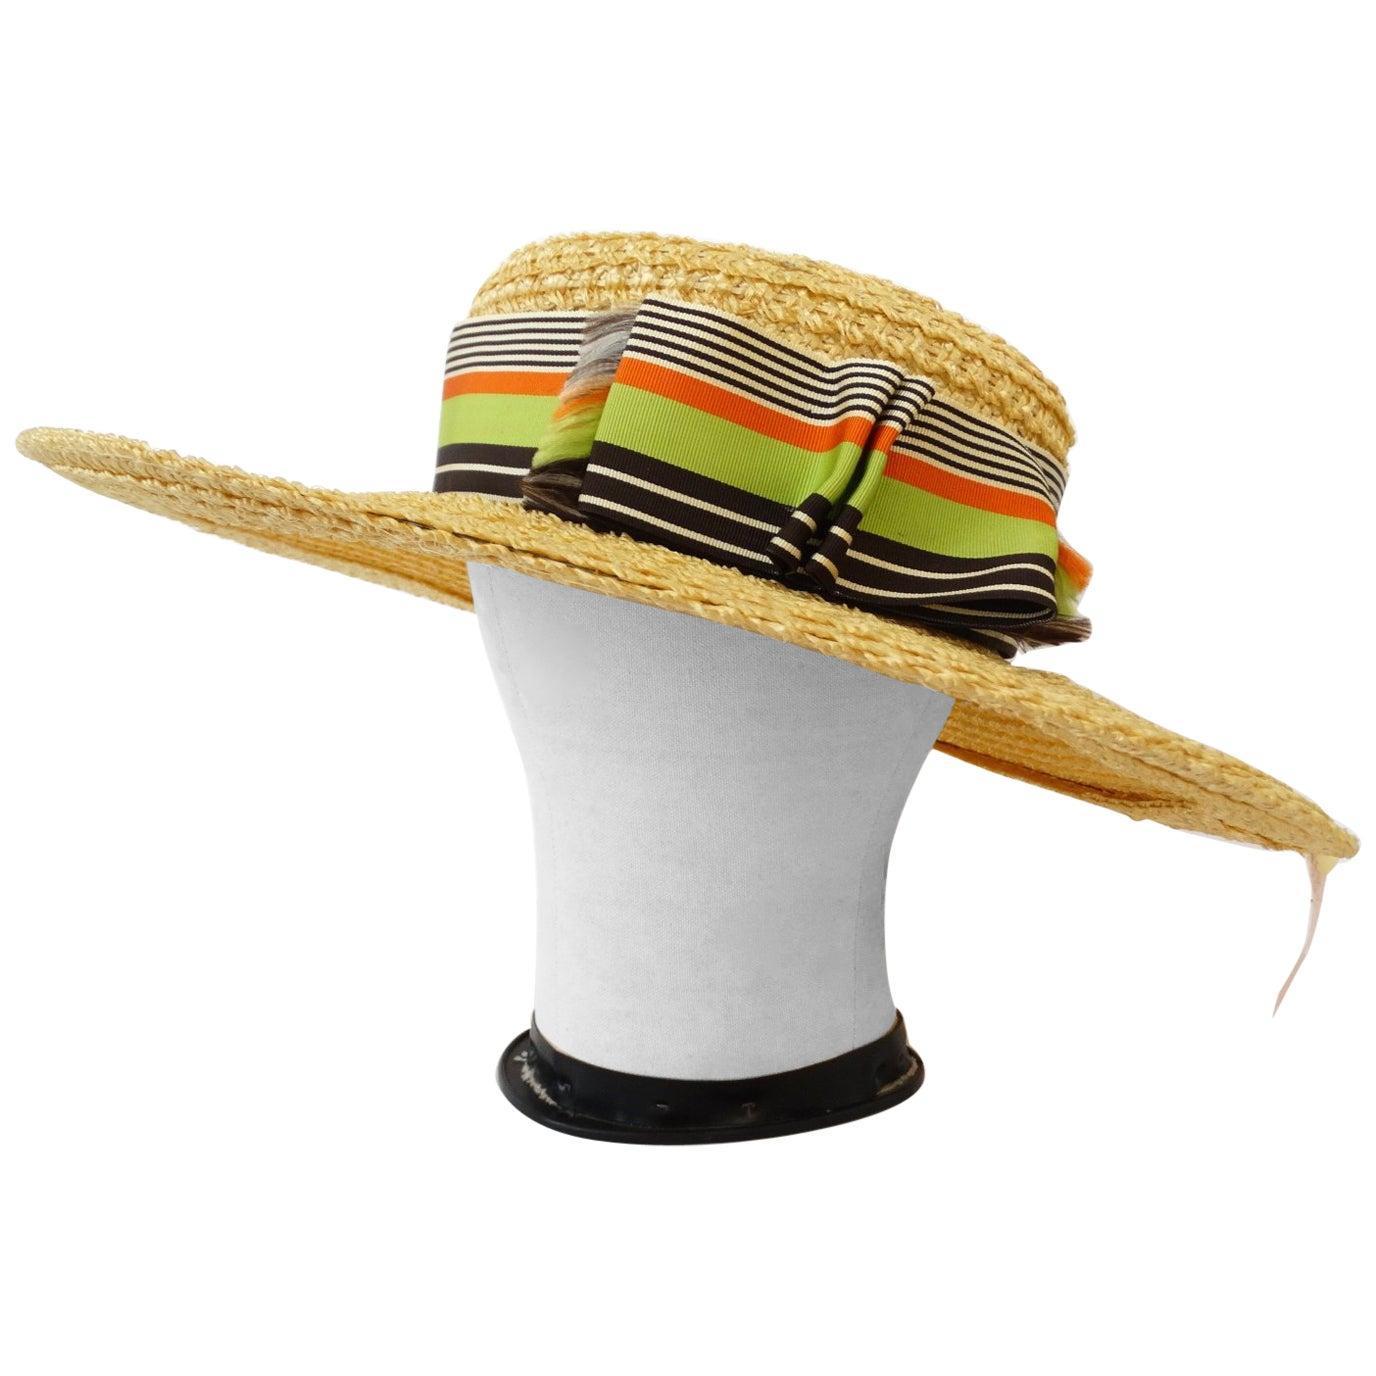 Yves Saint Laurent 1960s Wide Brim Straw Boater Hat